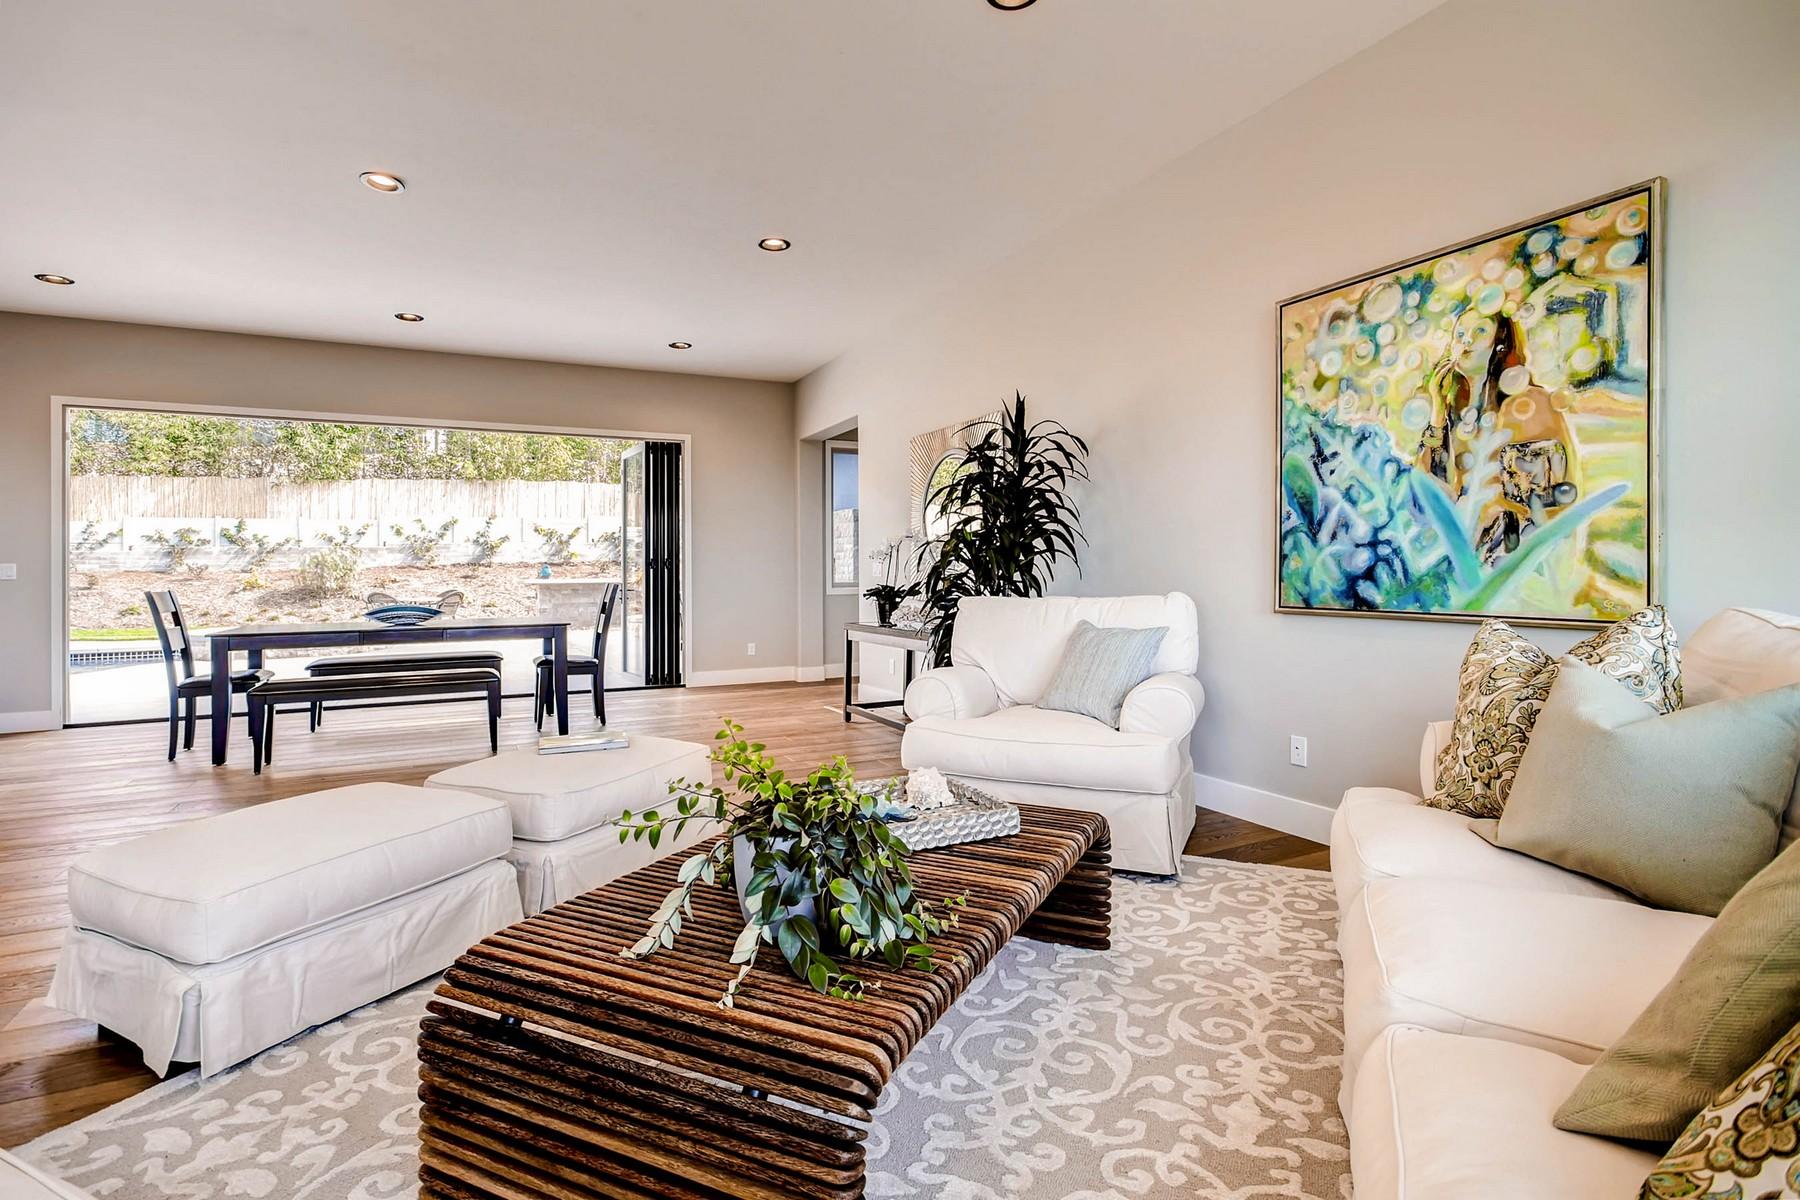 Additional photo for property listing at 6645 Avenida De Las Pescas  拉荷亚, 加利福尼亚州 92037 美国